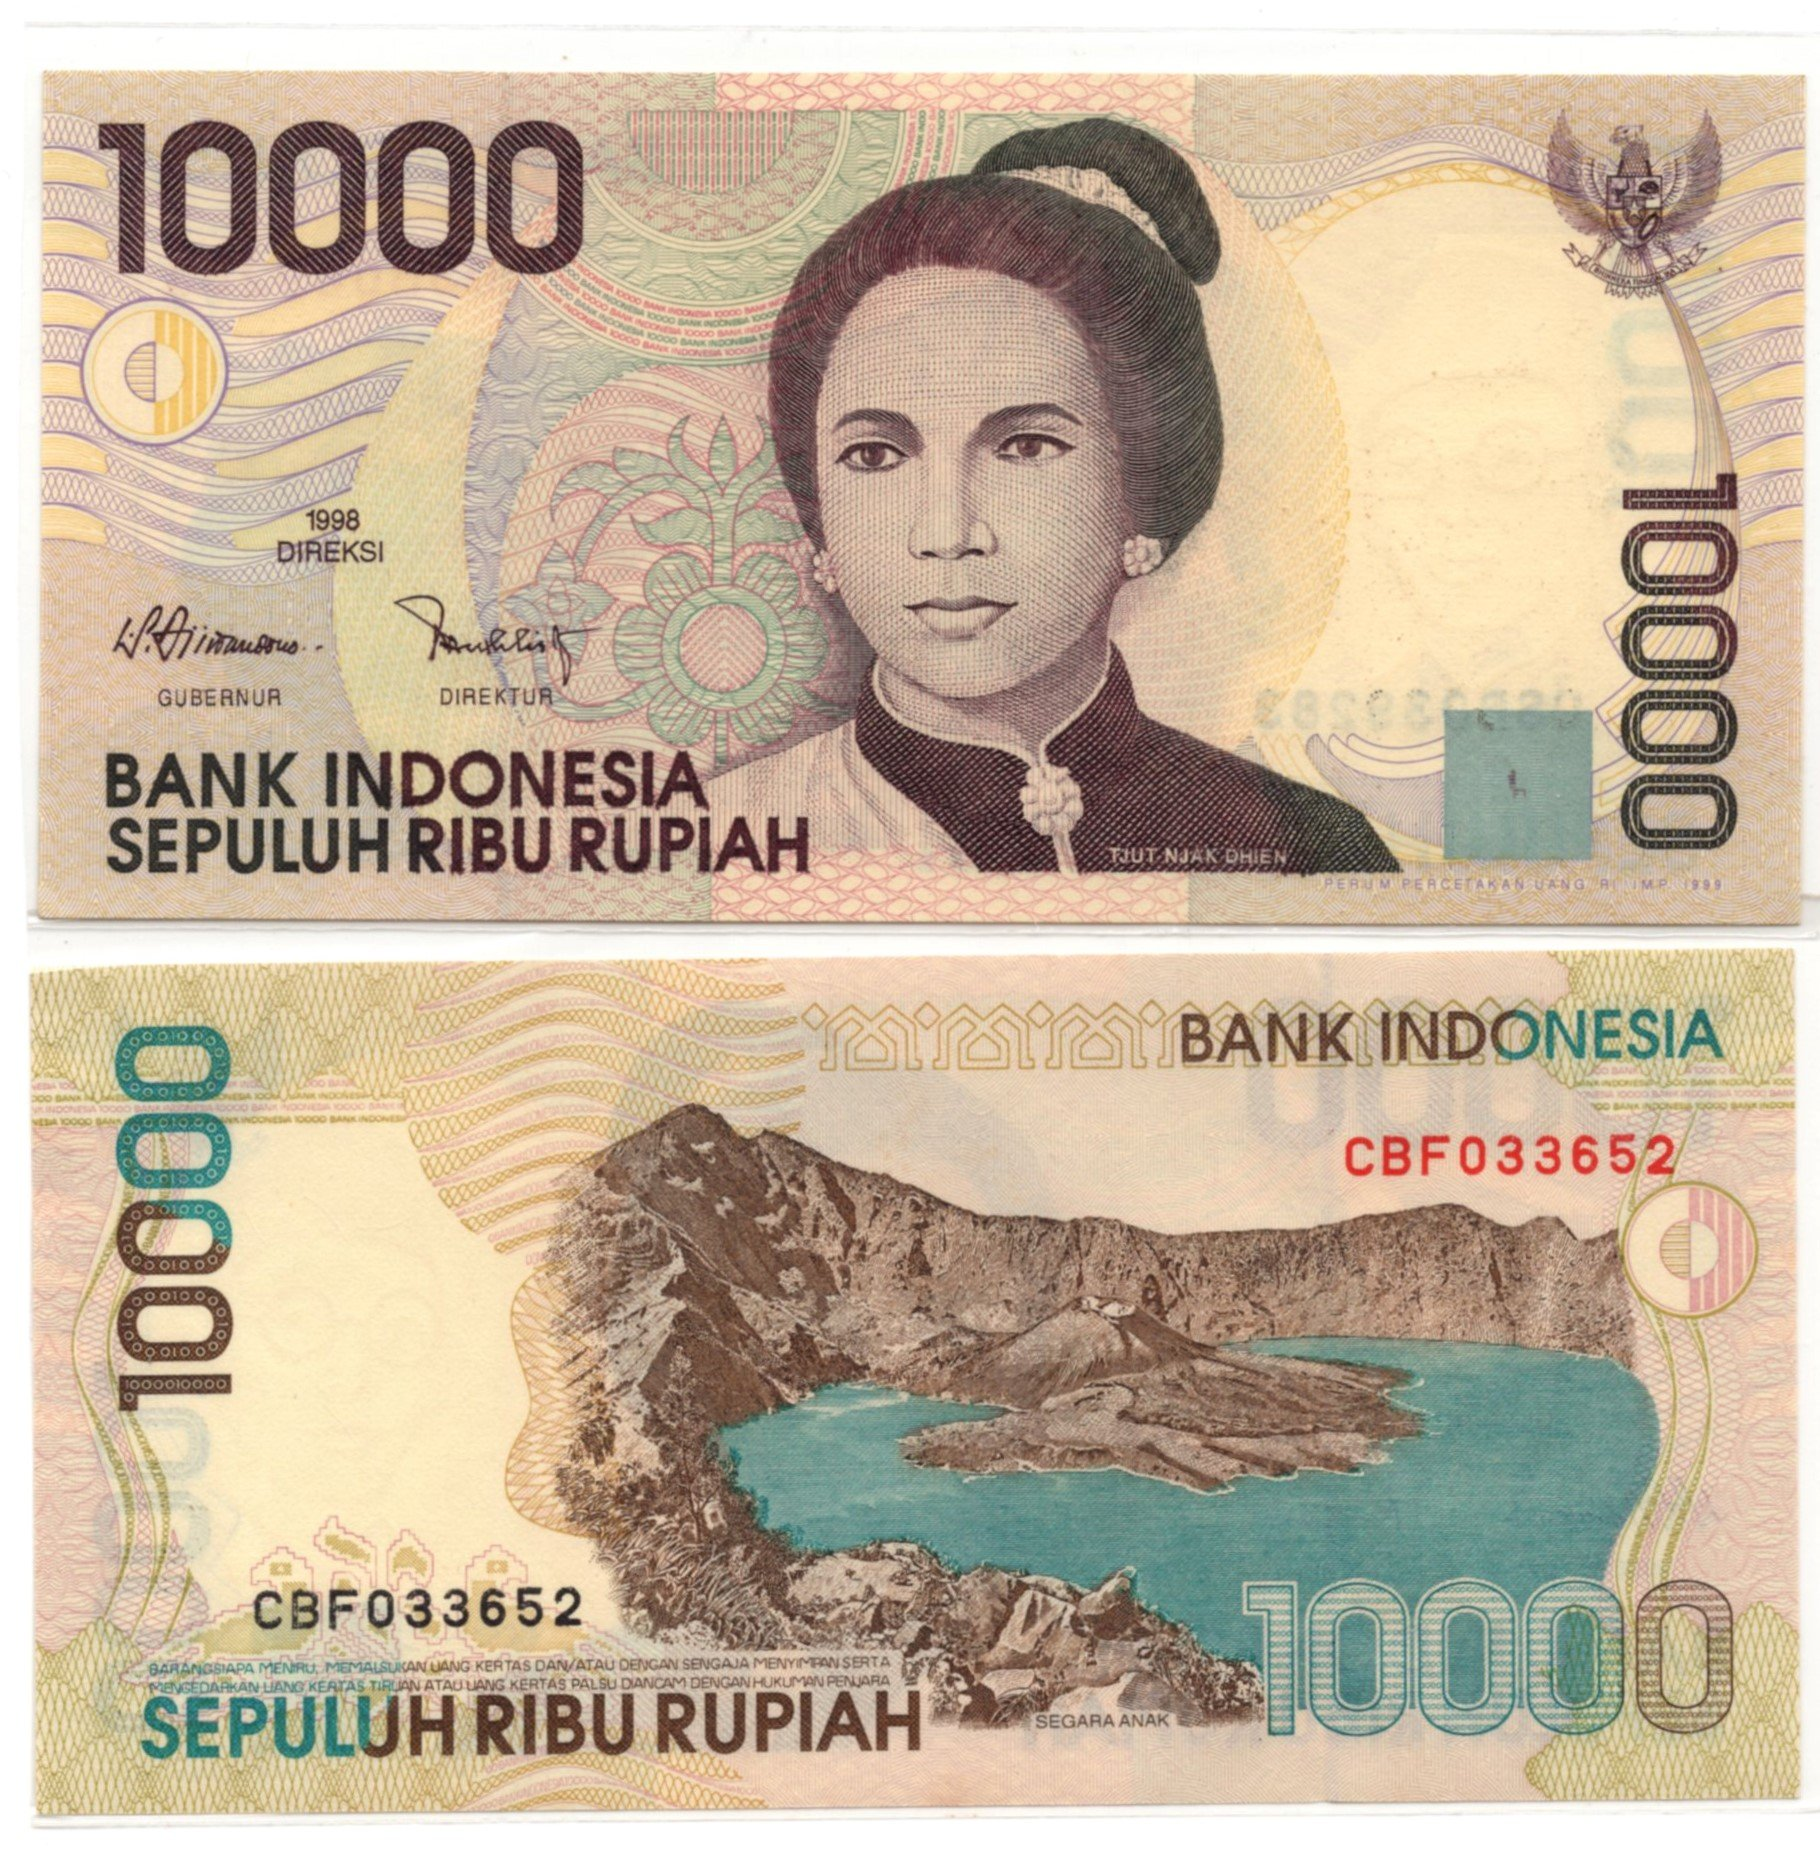 indonesia 10000 rupiah 1998